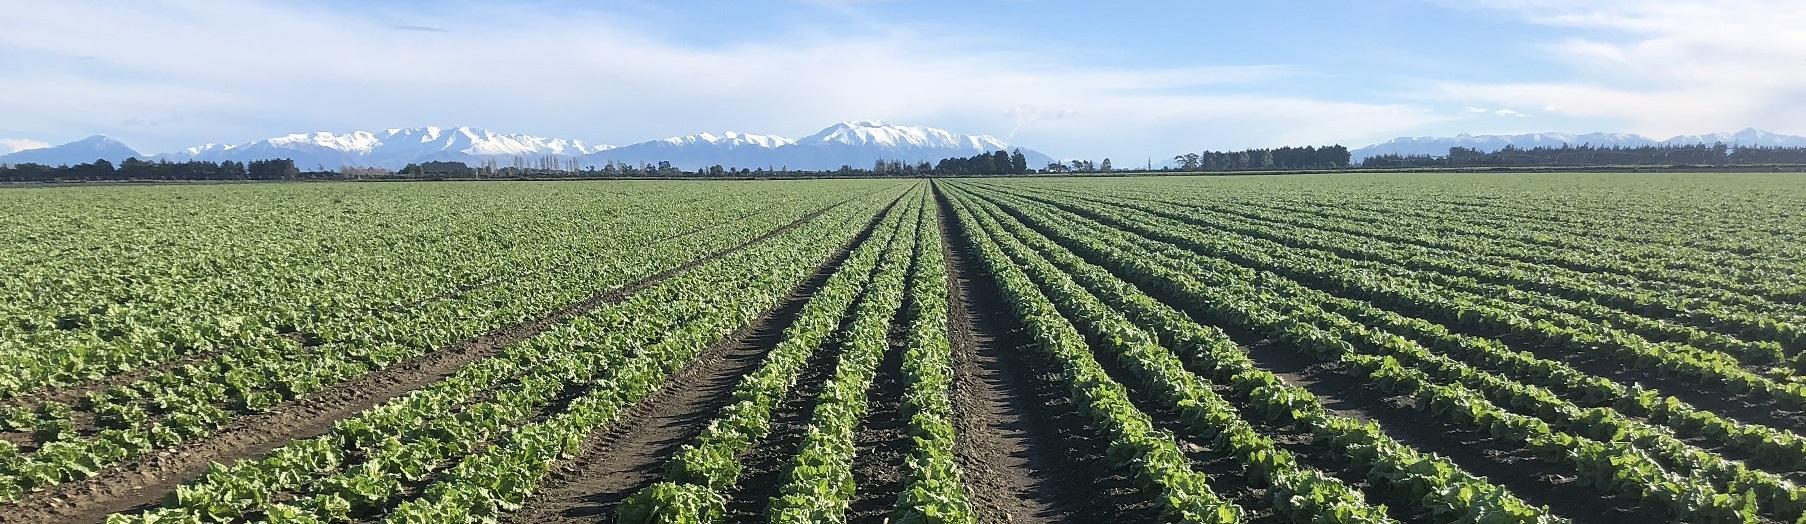 Lettuces-and-Mountains-landscape